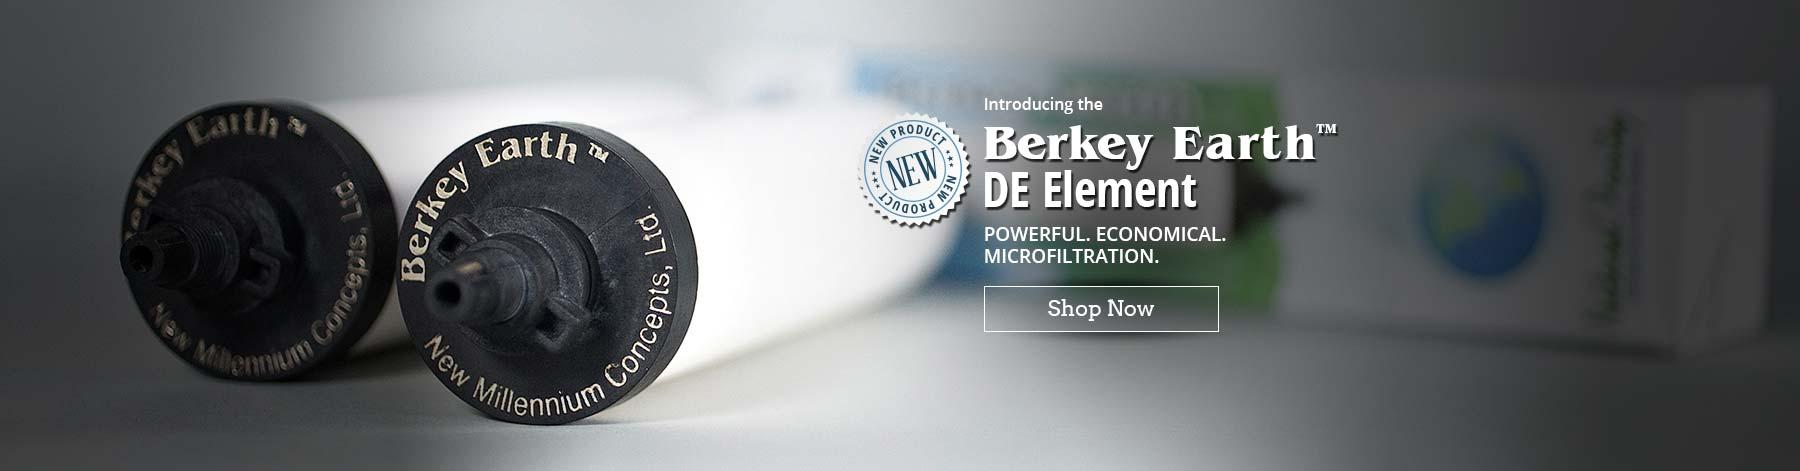 NEW! Berkey Earth DE Element - Powerful. Economical. Microfiltration. Click slide to shop now